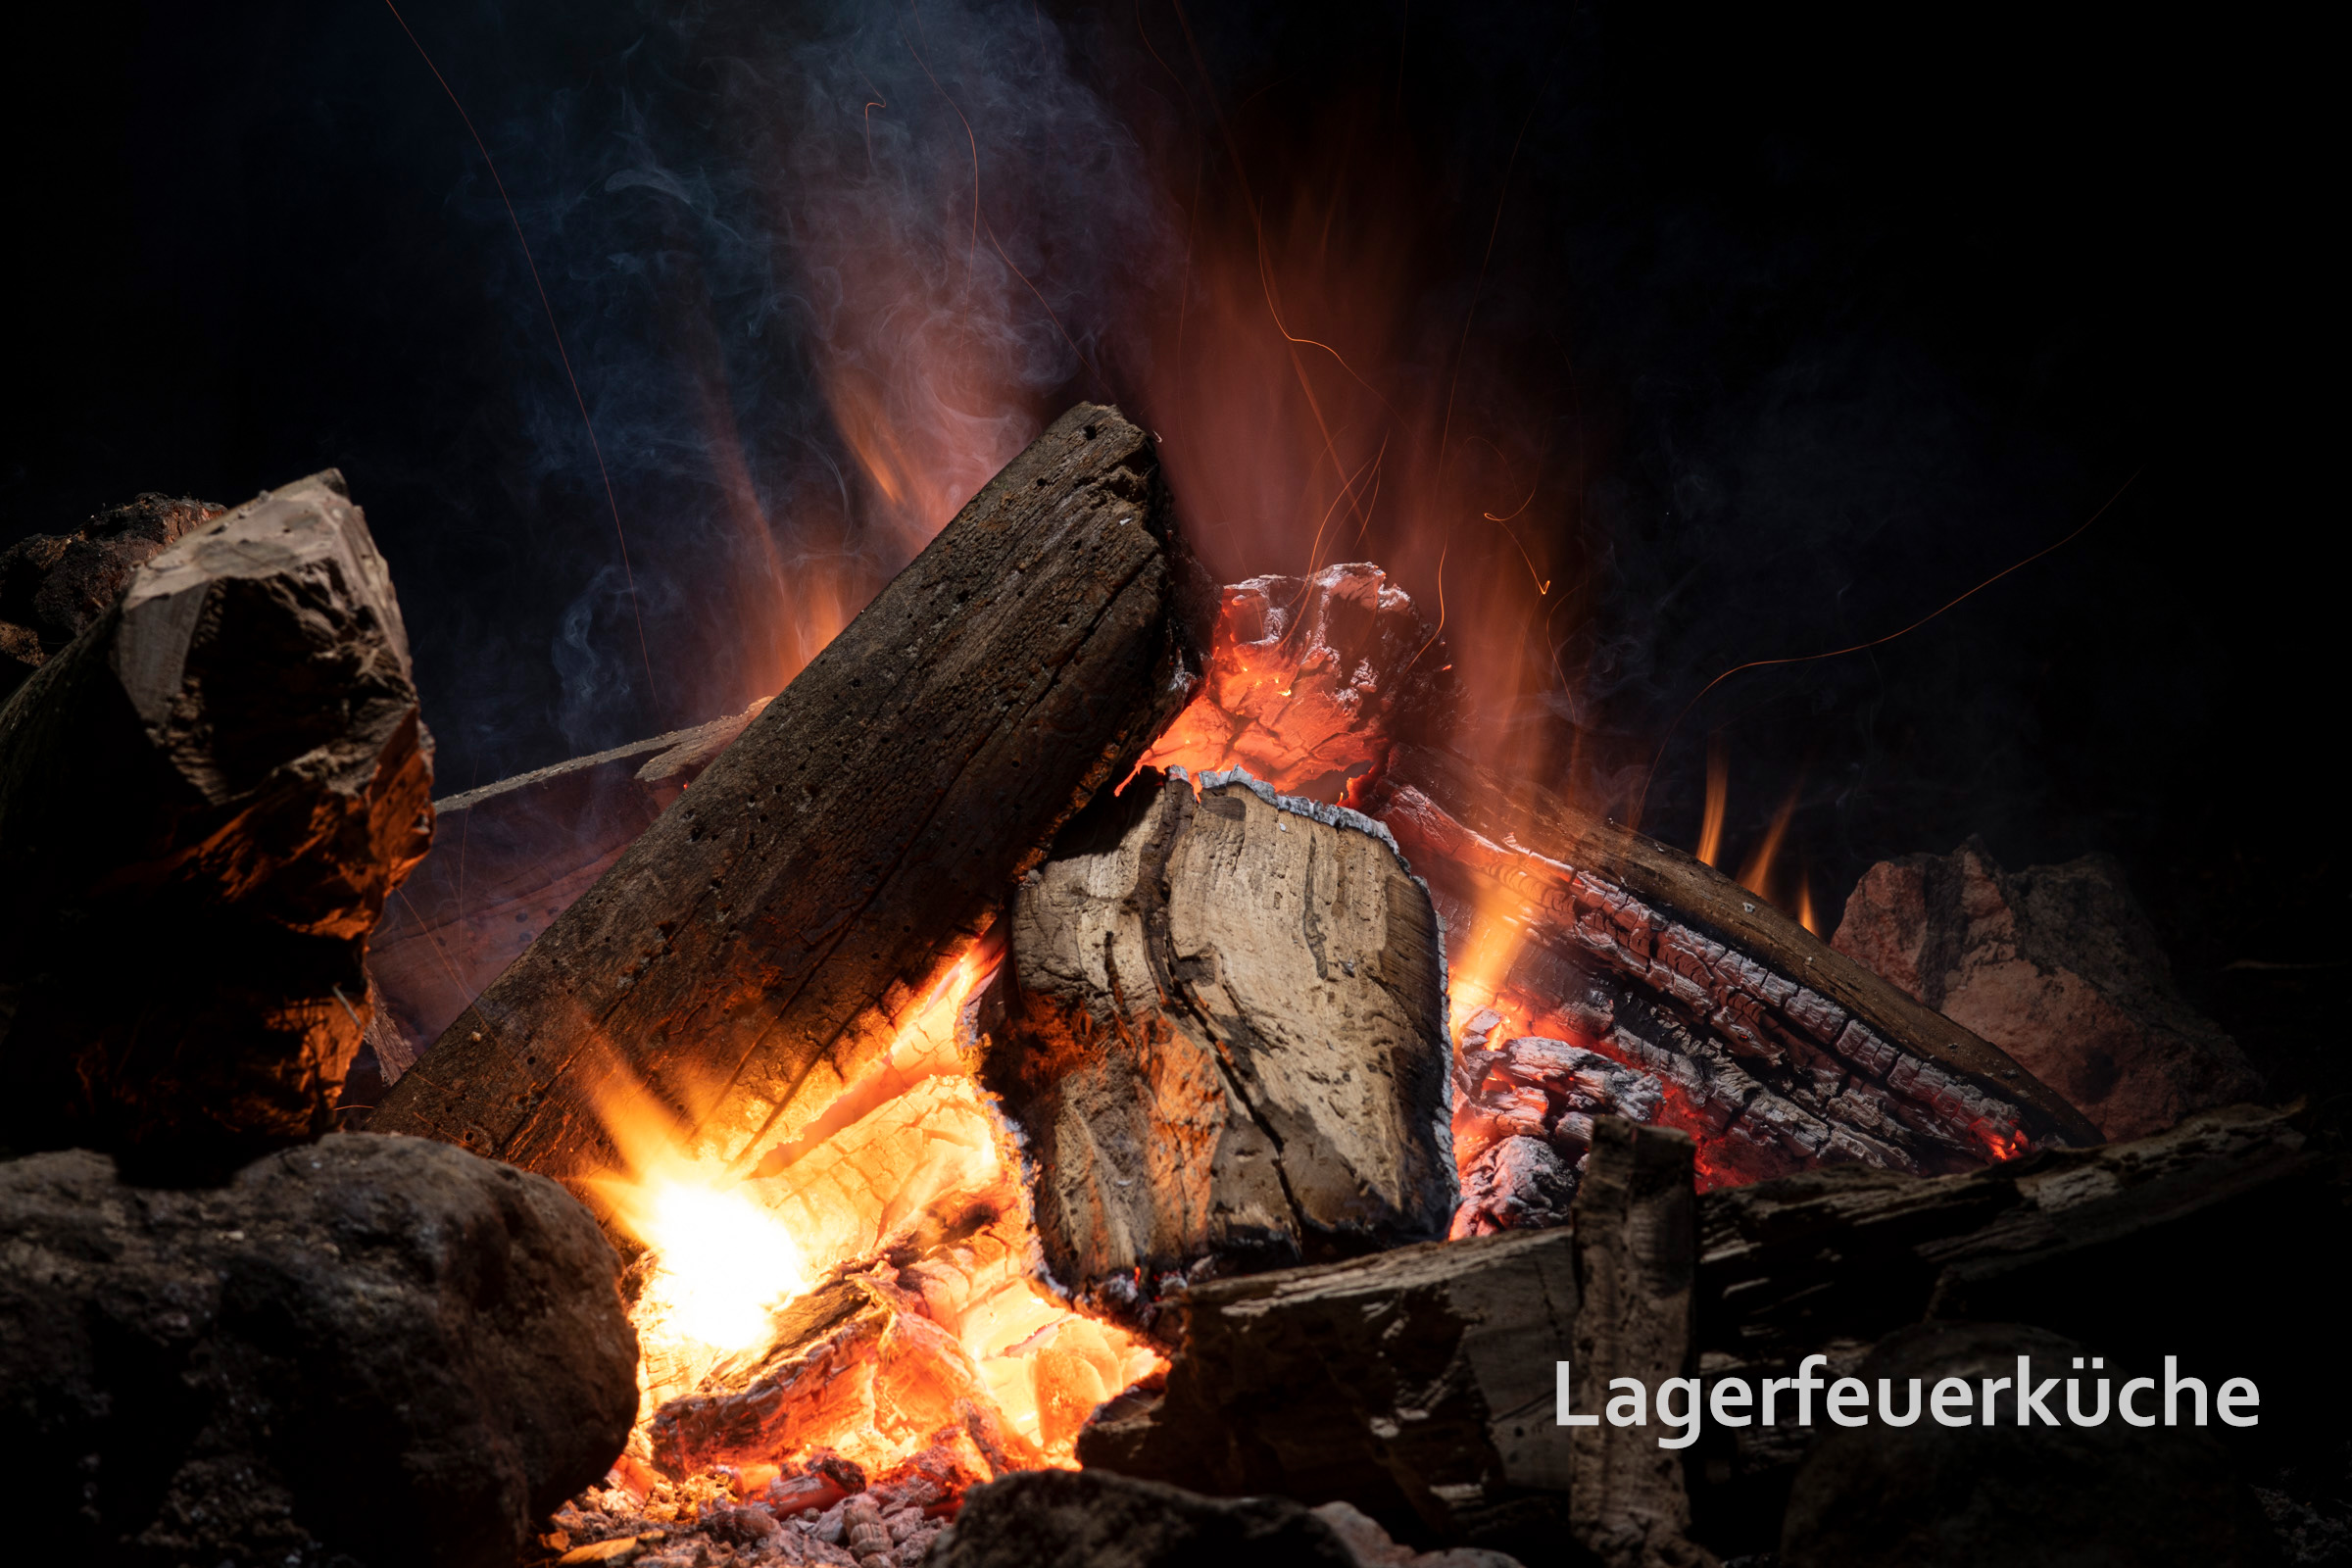 Lagerfeuerküche